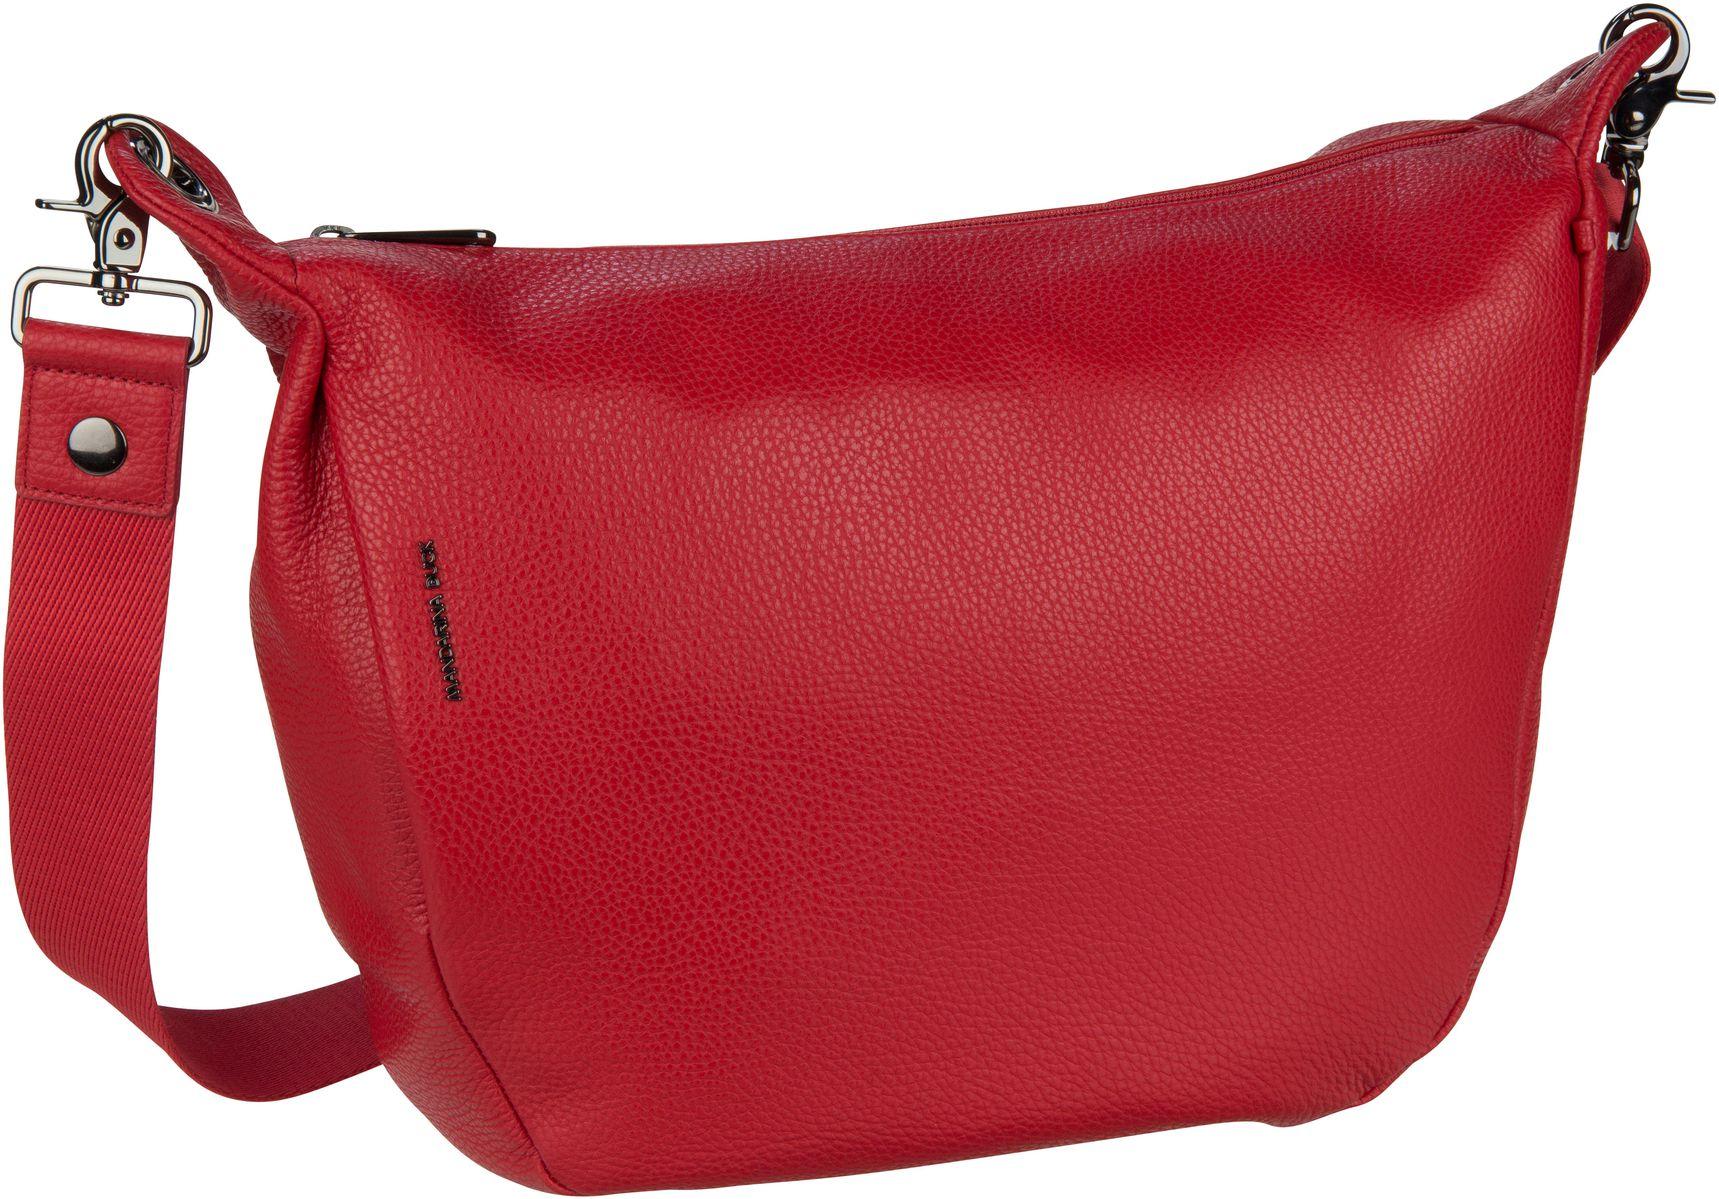 Umhängetasche Mellow Leather Crossbody Flame Scarlet (innen: Grau)